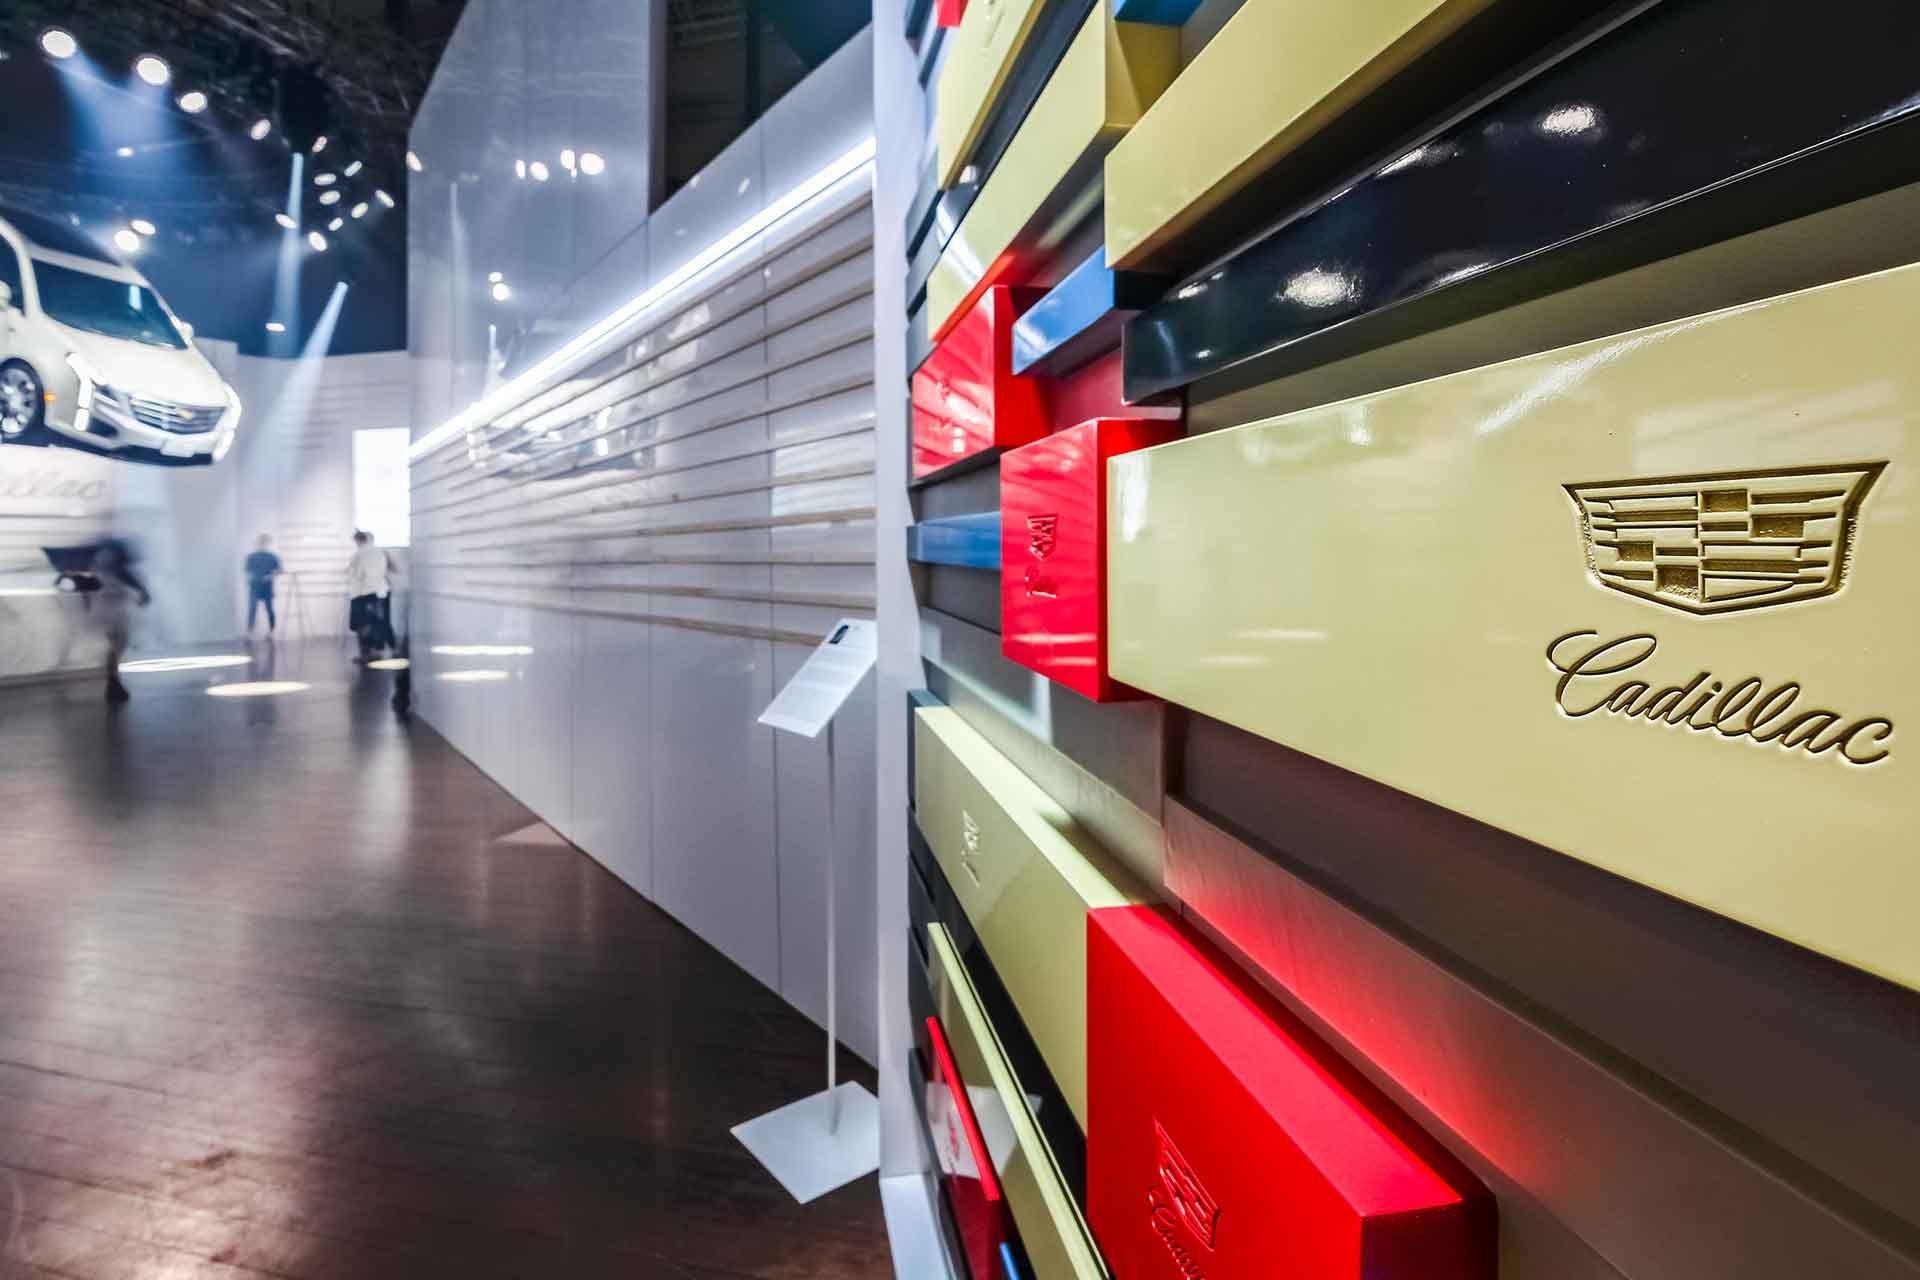 Cadillac_2016_XT5_private_media_Launch_event_automotive_custom_Design_fabrication_Toronto